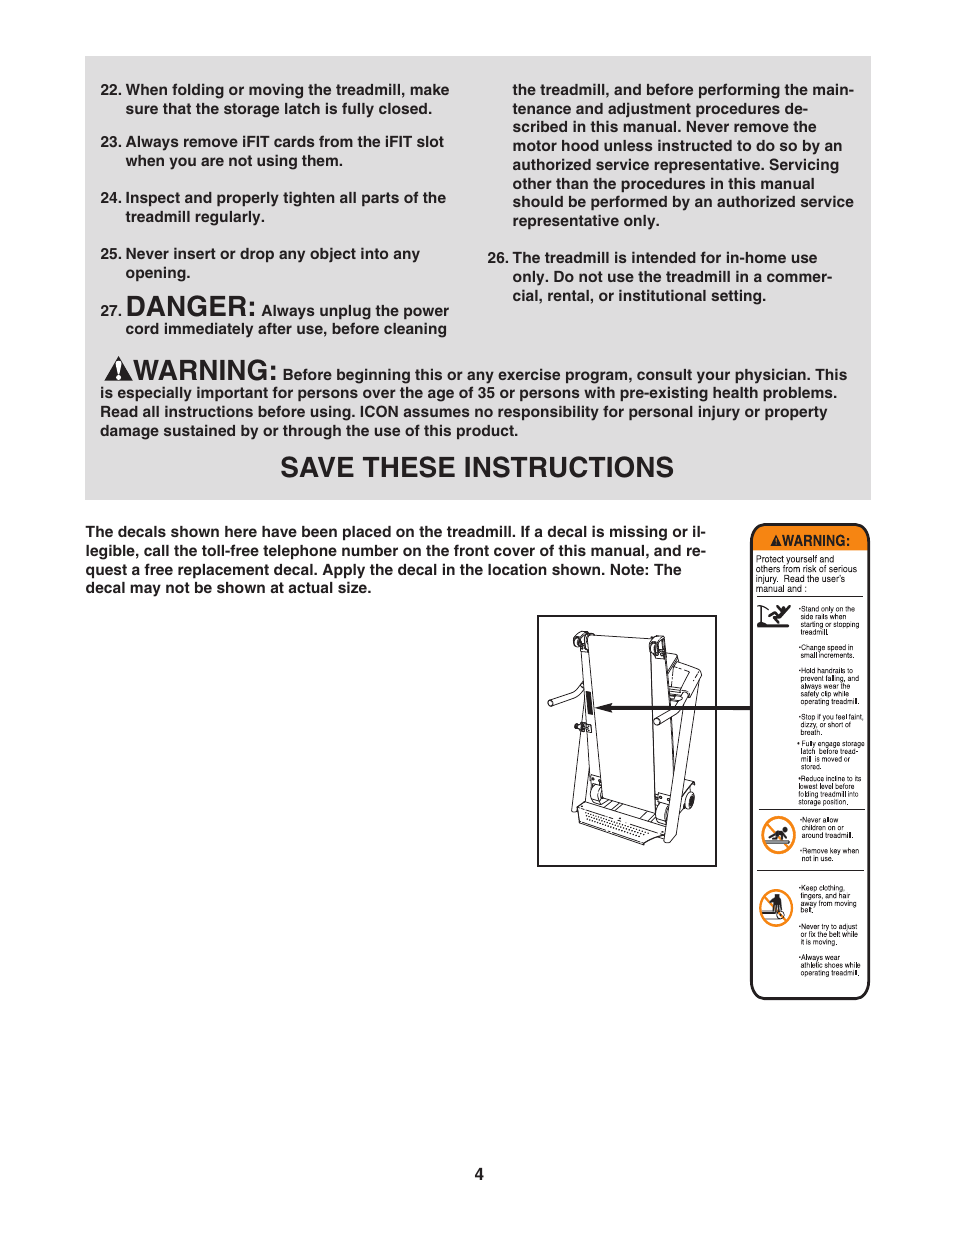 danger warning save these instructions nordictrack apex 6500 rh manualsdir com apex 6100 user manual apex cpap user manual